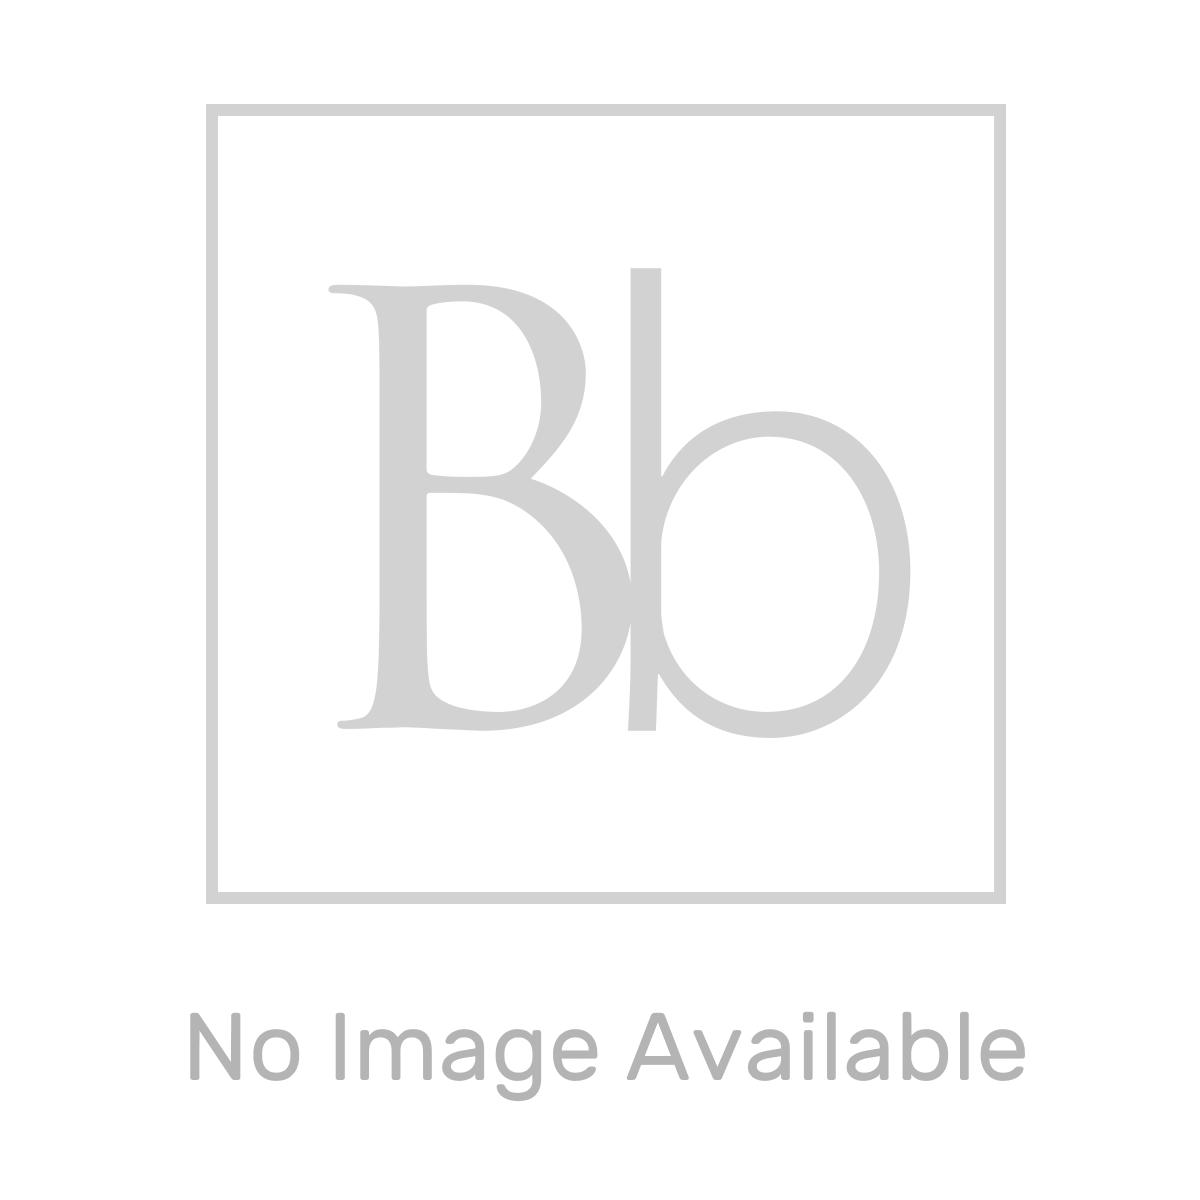 RAK Chrome Square Ceiling Mounted Shower Arm 250mm Measurements